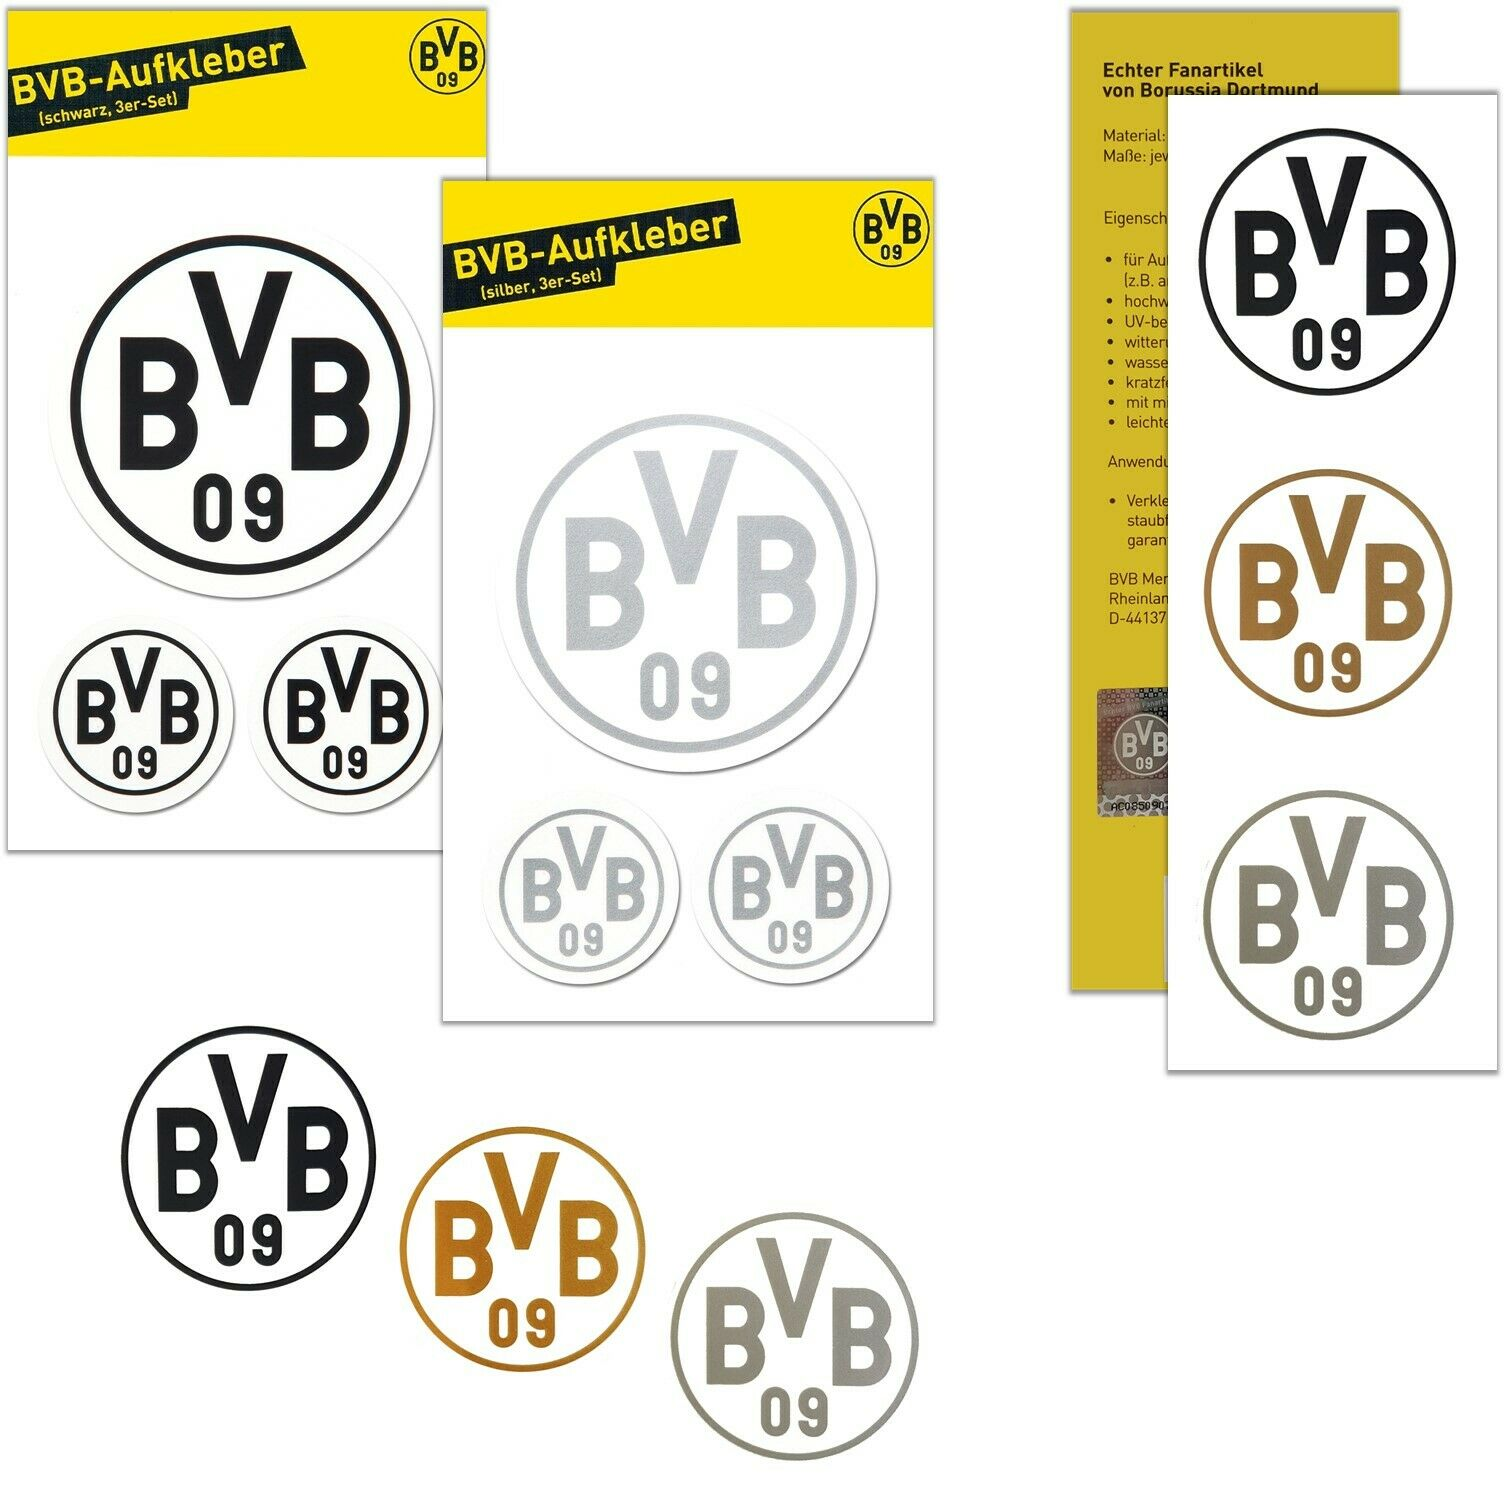 Fanartikel a/´125 g B/älle - Schokob/älle-Dose - Schoko Logo Fu/ßball BVB 09-3 x BVB-Schokoladenfu/ßb/älle Weihnachten 2019 4,24 /€ // 100 g Liga